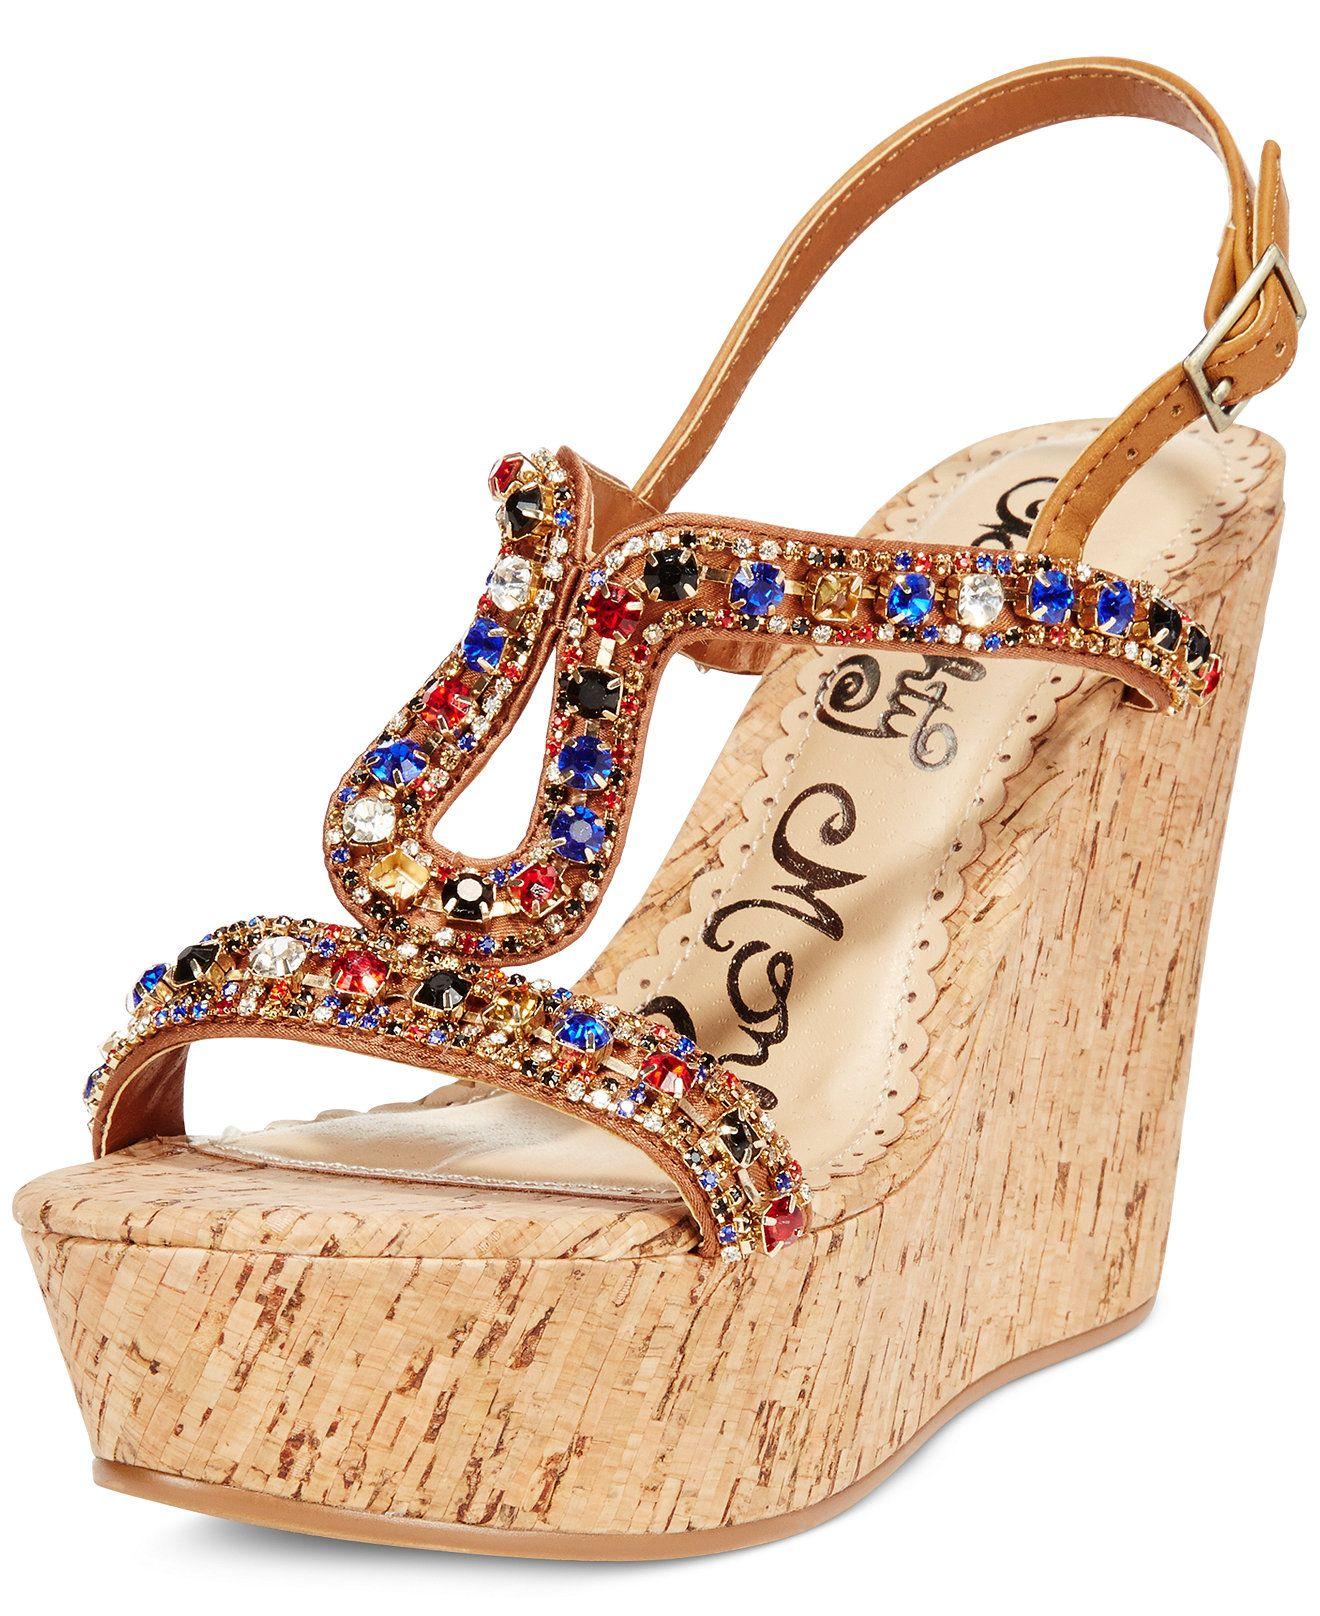 2246d601cc9b Naughty Monkey Chasing Rainbow Platform Wedge Sandals - Sandals - Shoes -  Macy s